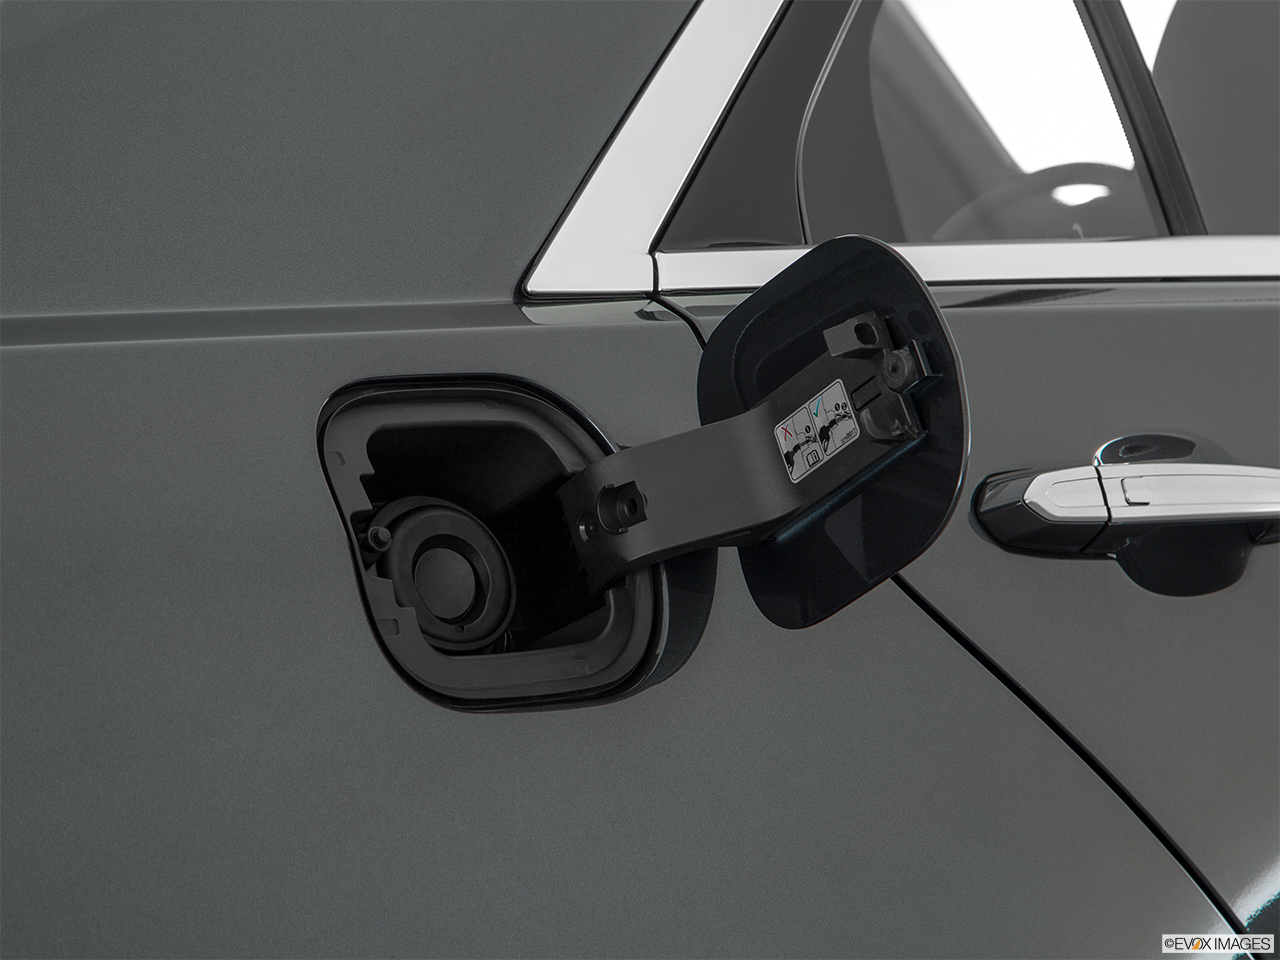 Saudi Arabia Car Insurance Companies List